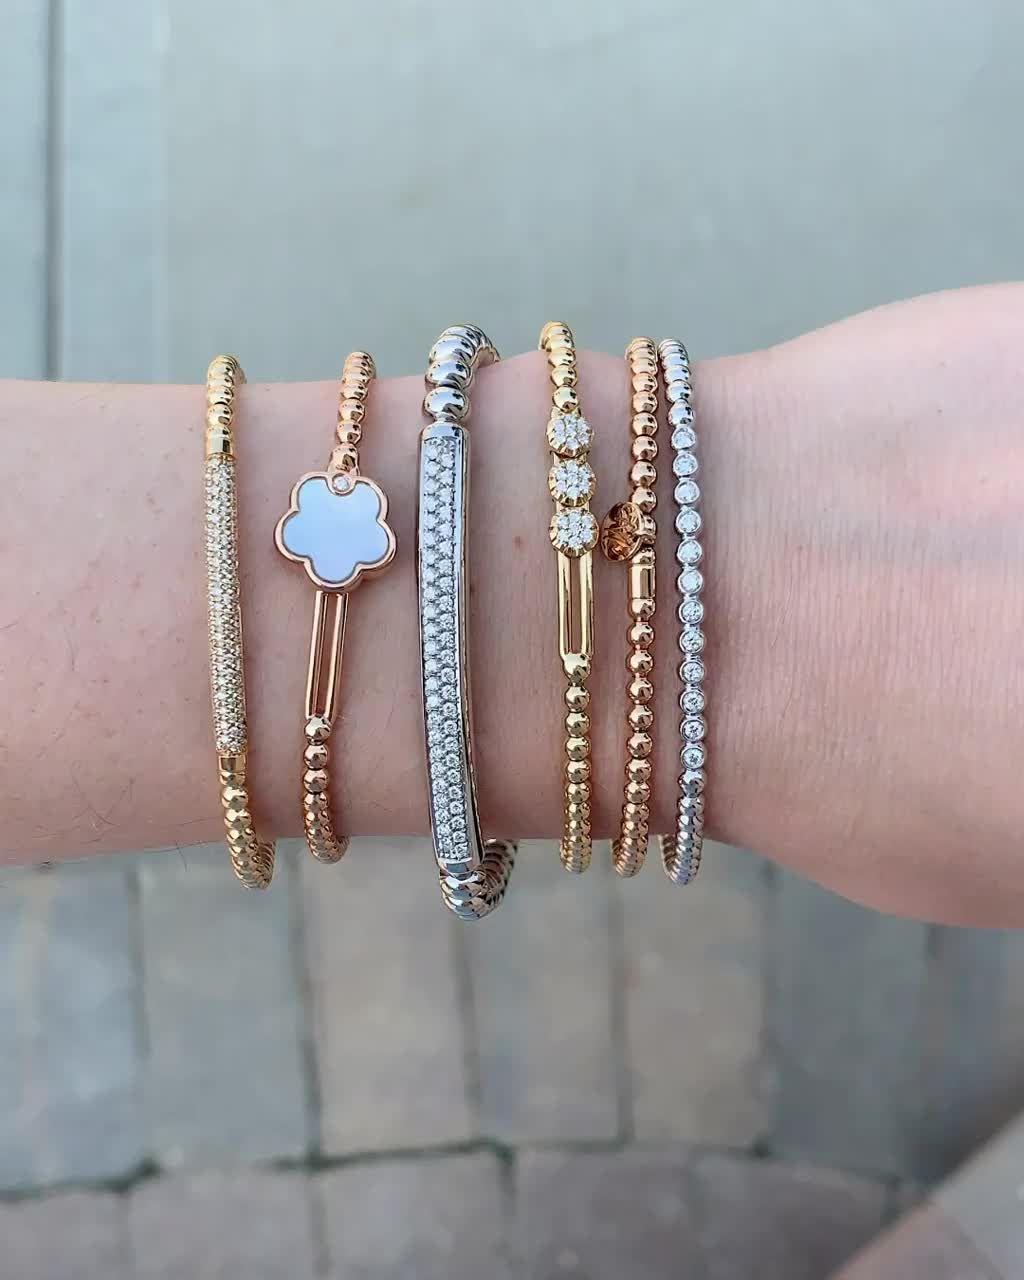 Happy Friday! #Hulchi_Belluni #RaznyJewelers #classicjewelry #luxury #accessorie…